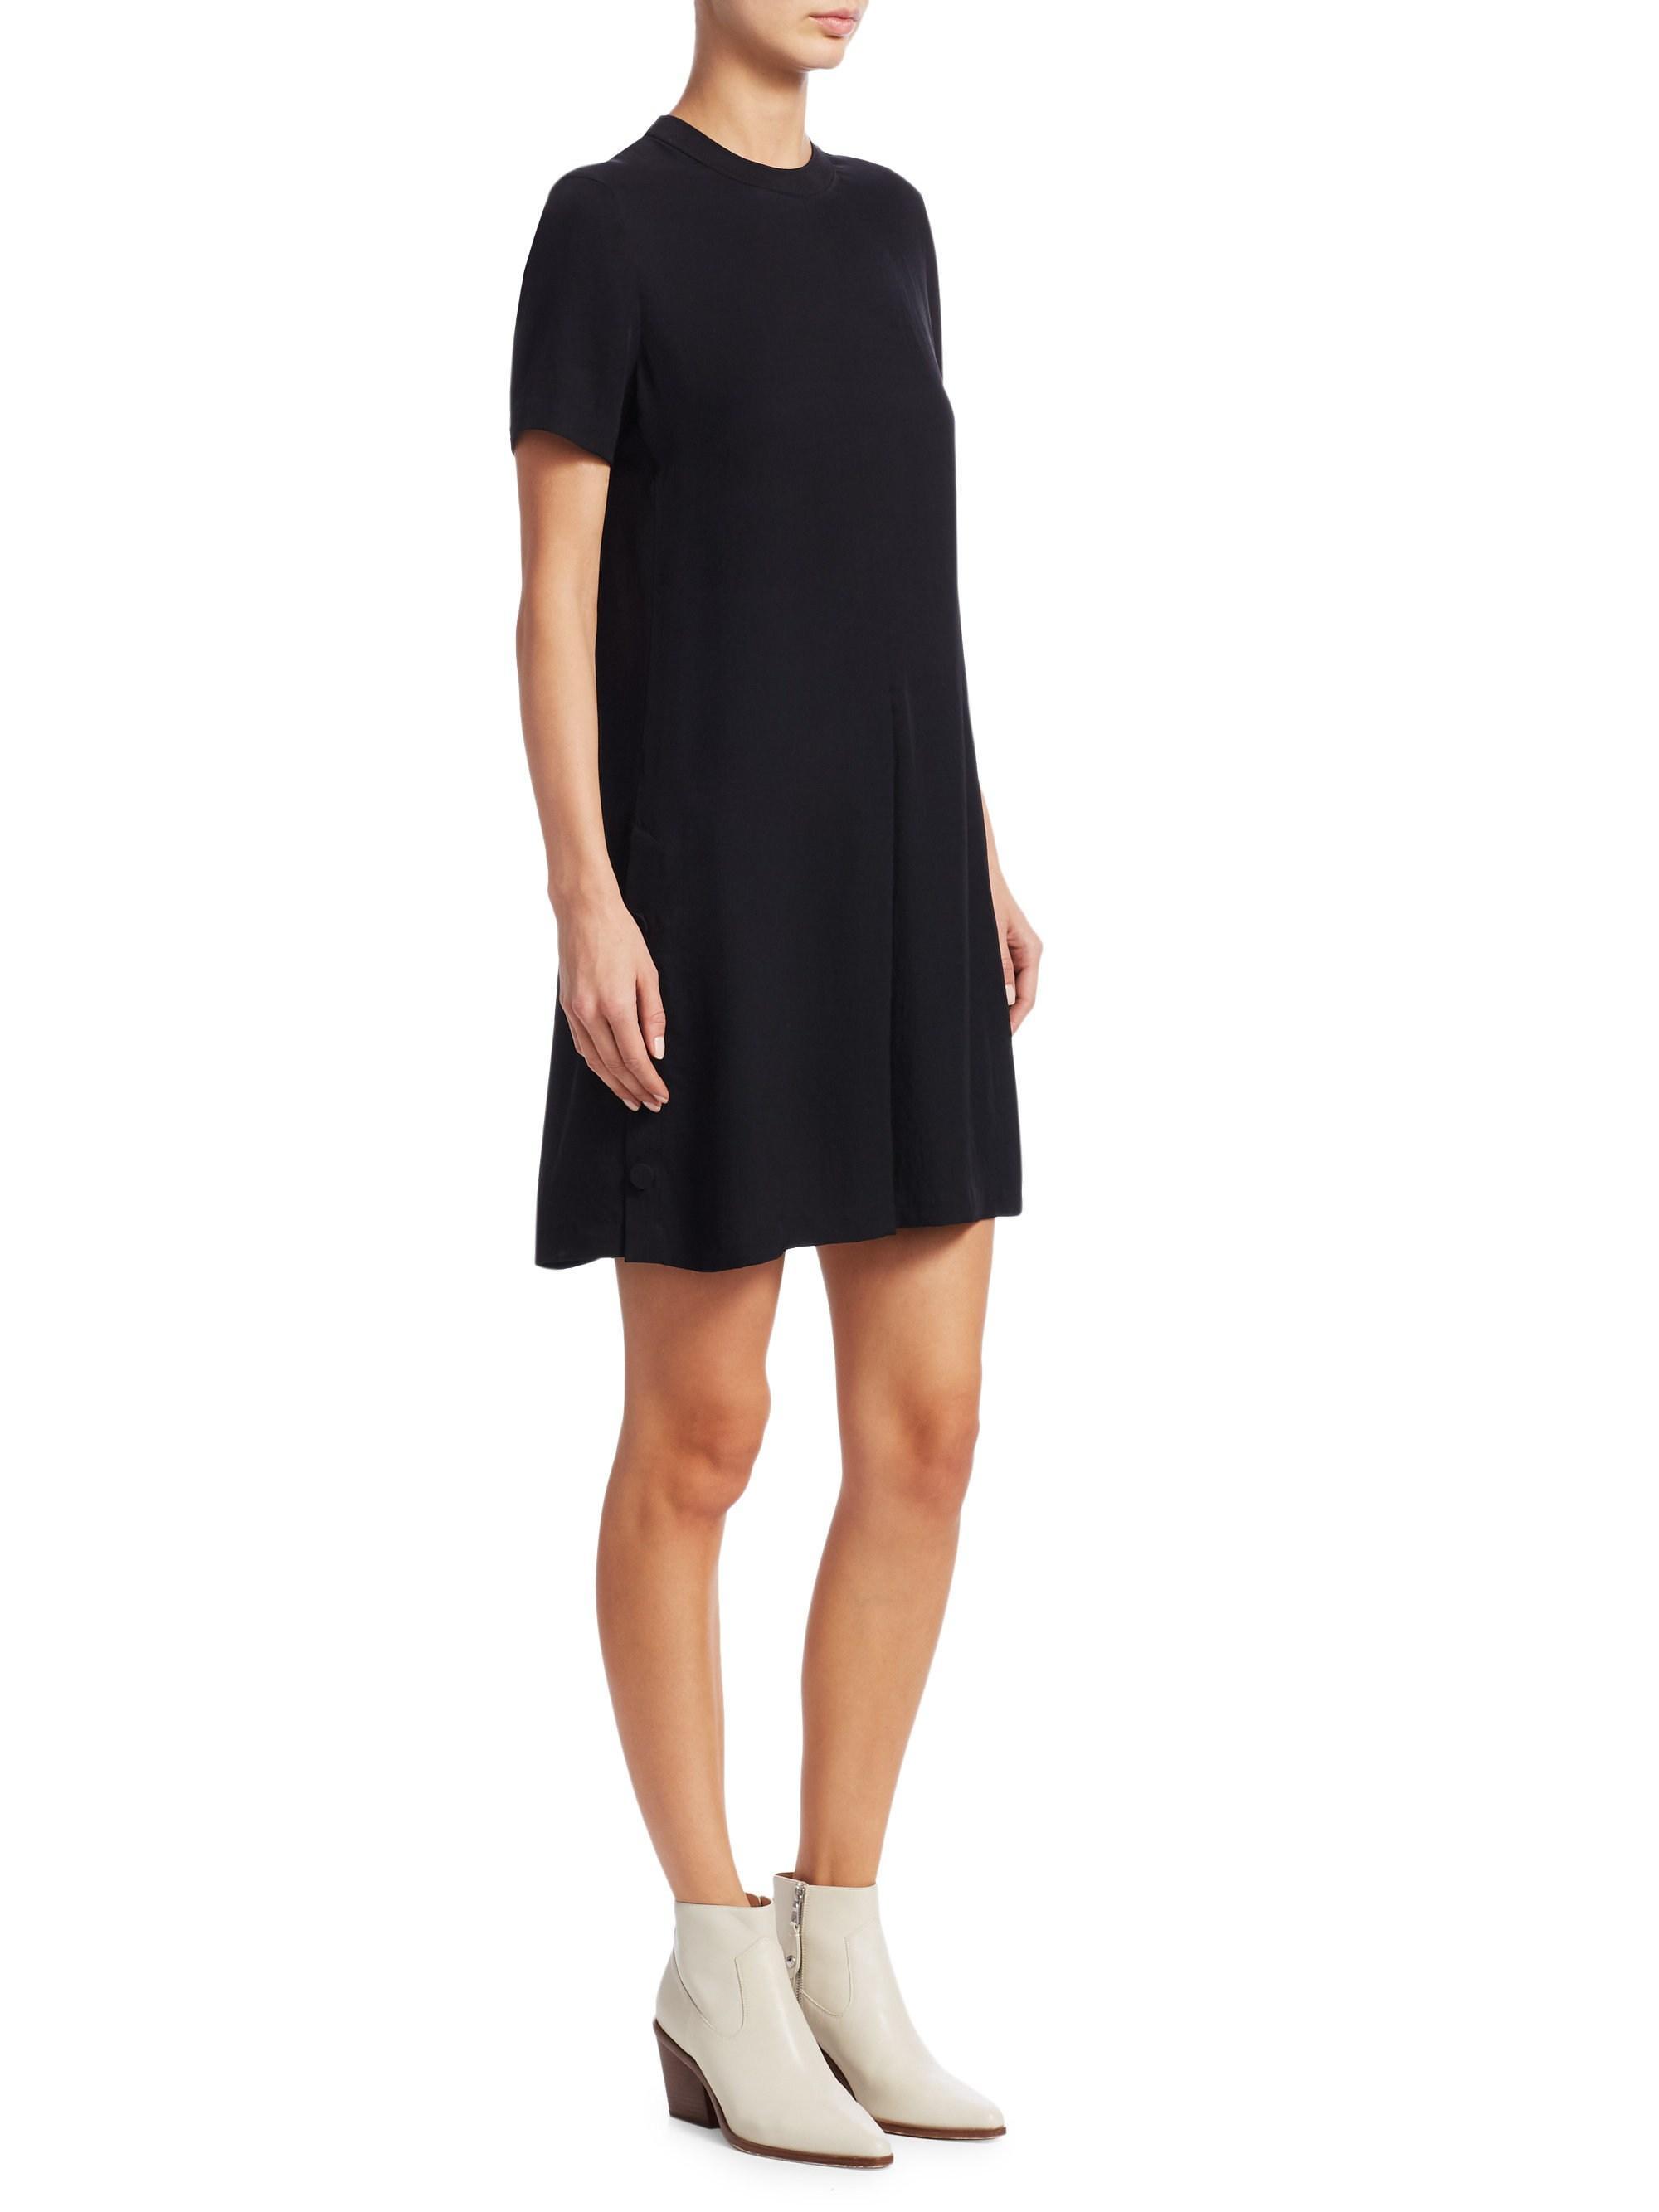 7730443964cc Rag & Bone Aiden Buttoned Flare T-shirt Dress in Black - Lyst